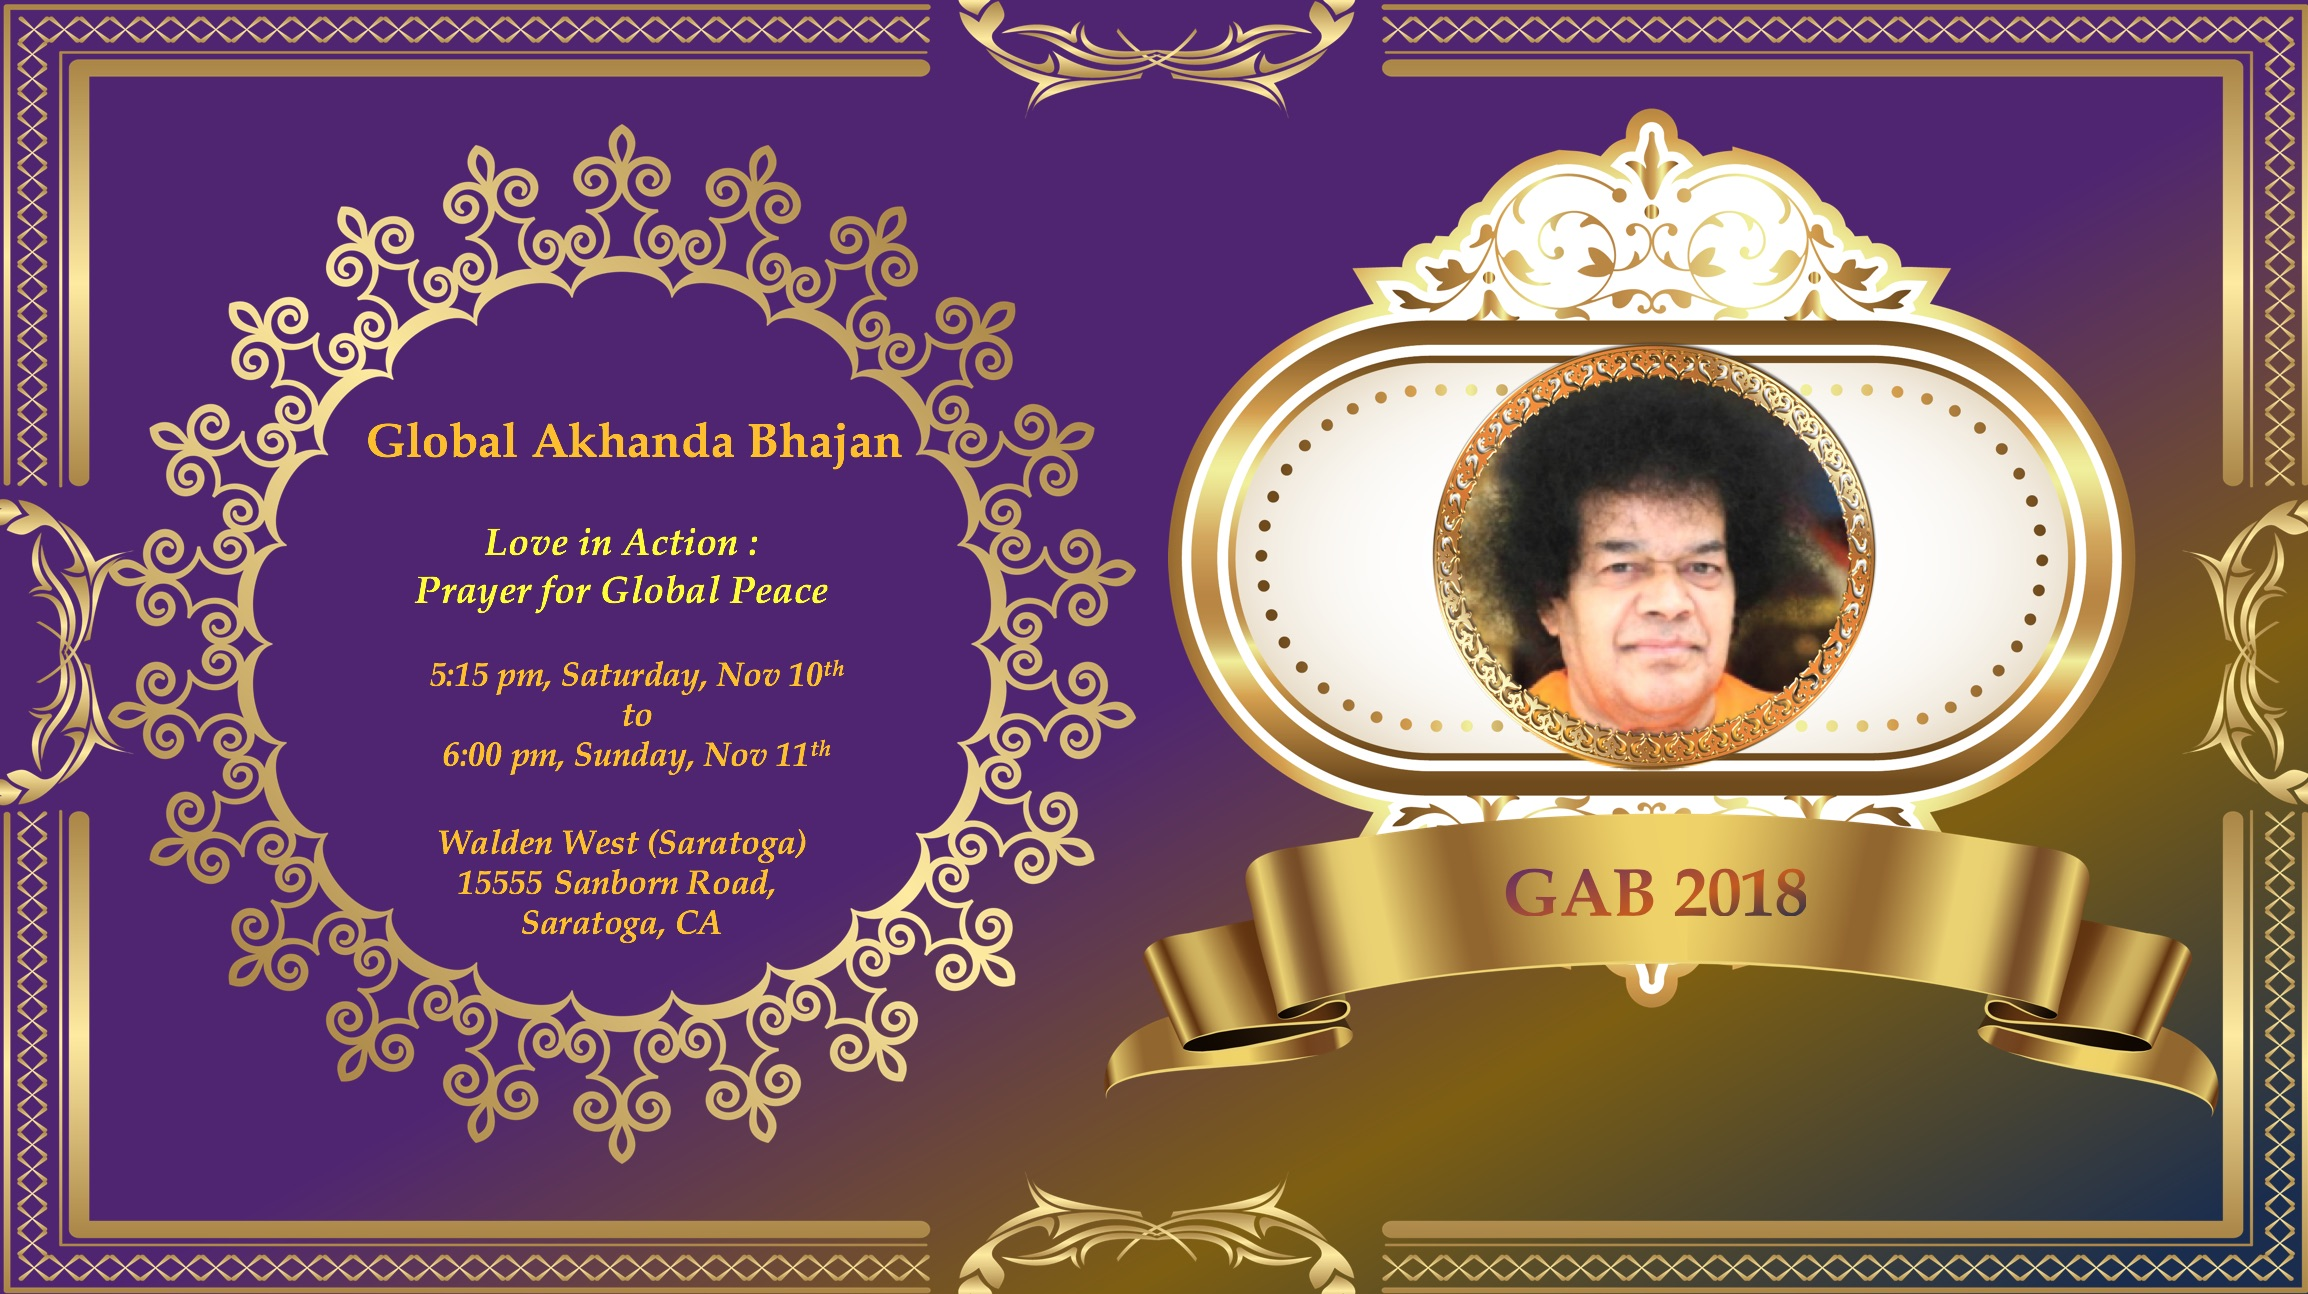 Global Akhanda Bhajan